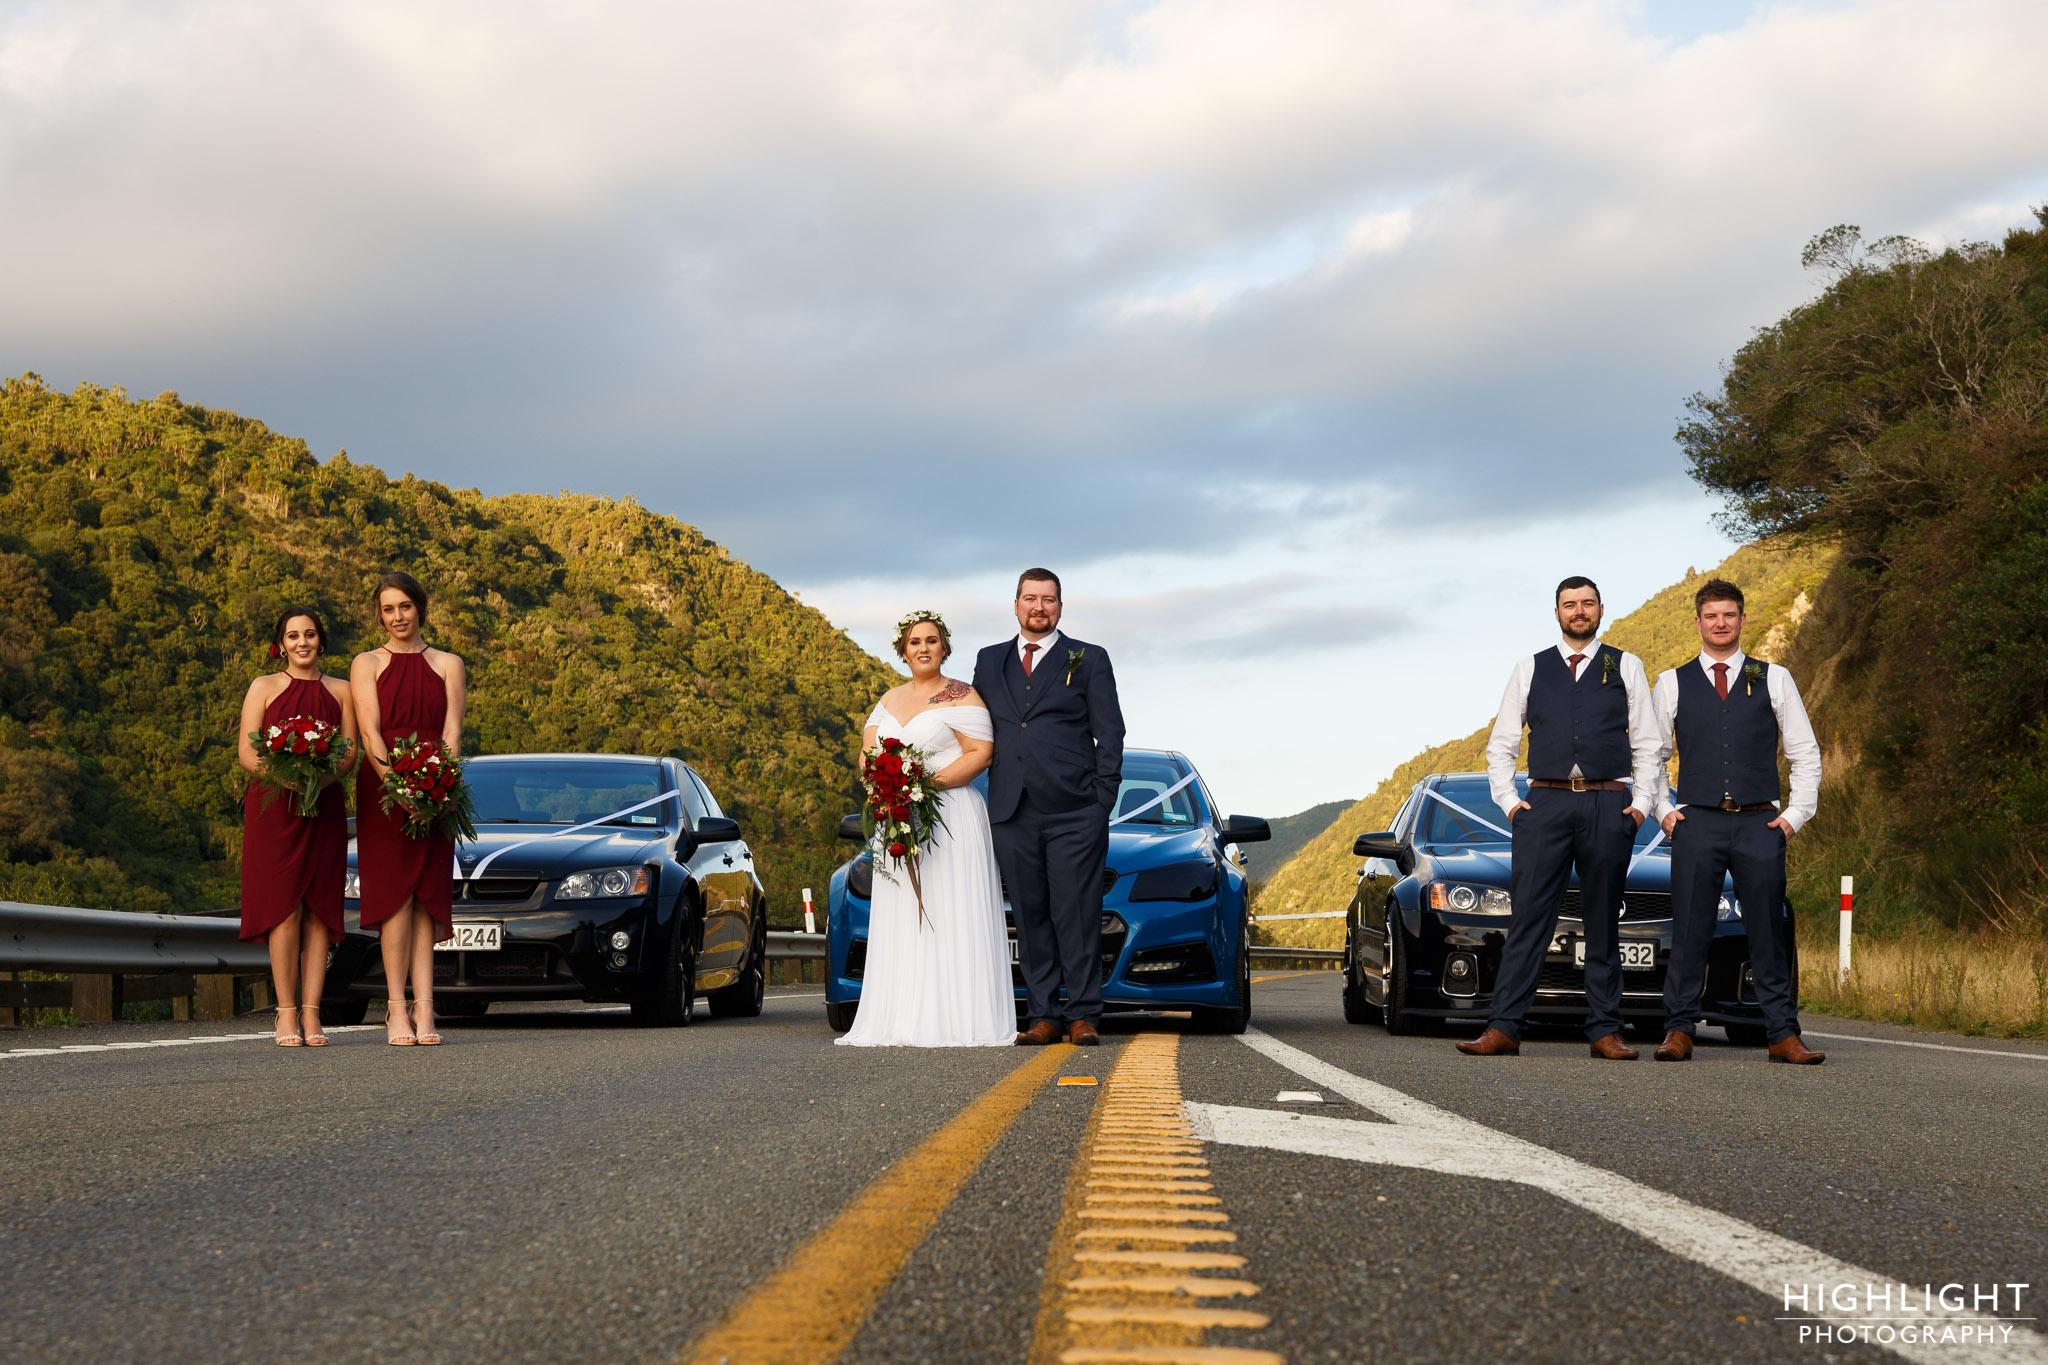 Highlight-wedding-photography-new-zealand-palmerston-north-81.jpg